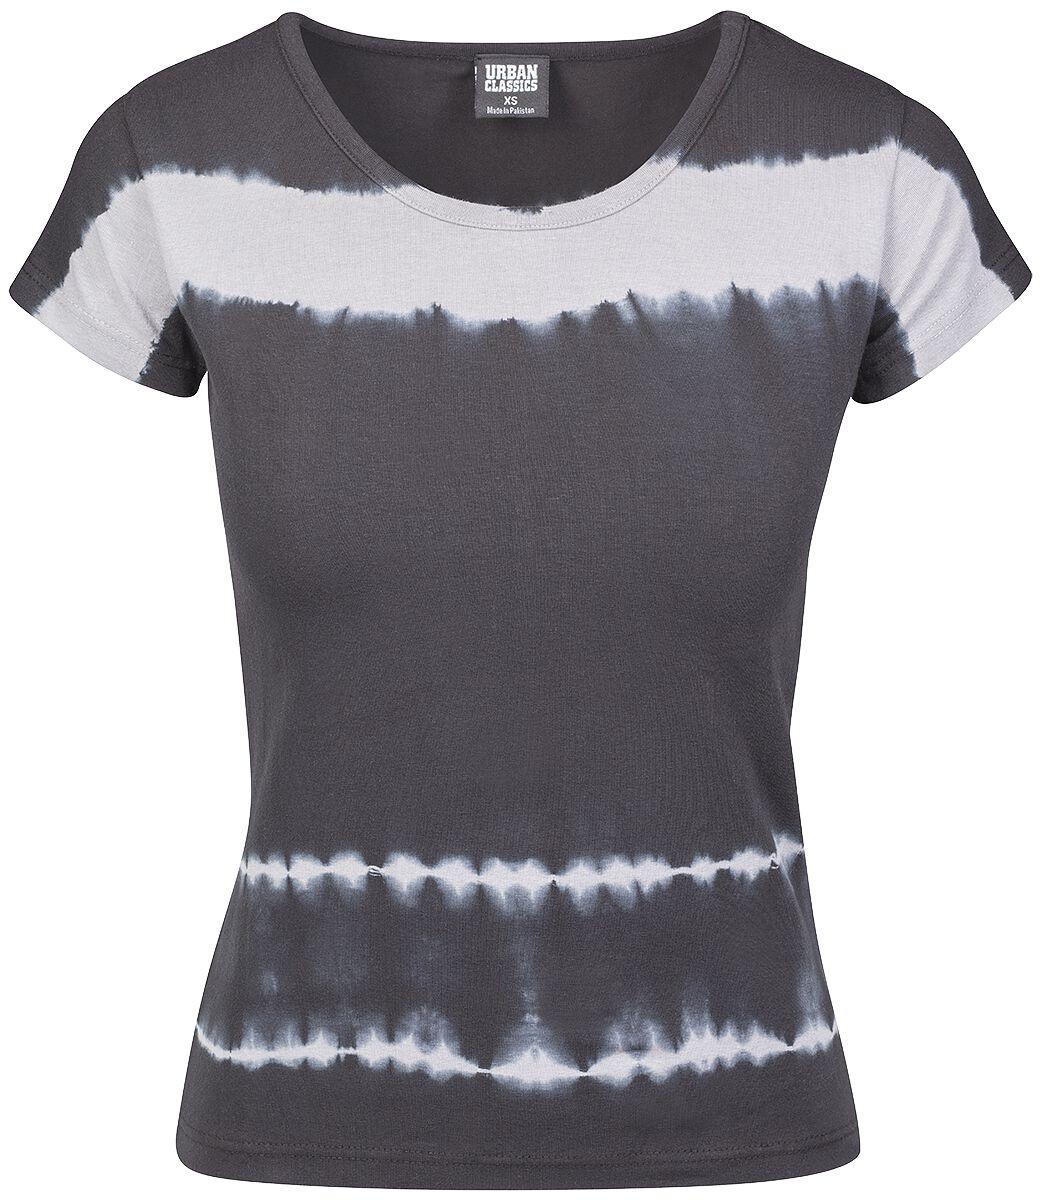 Urban Classics Ladies Striped Tie Dye Tee Koszulka damska czarny/szary